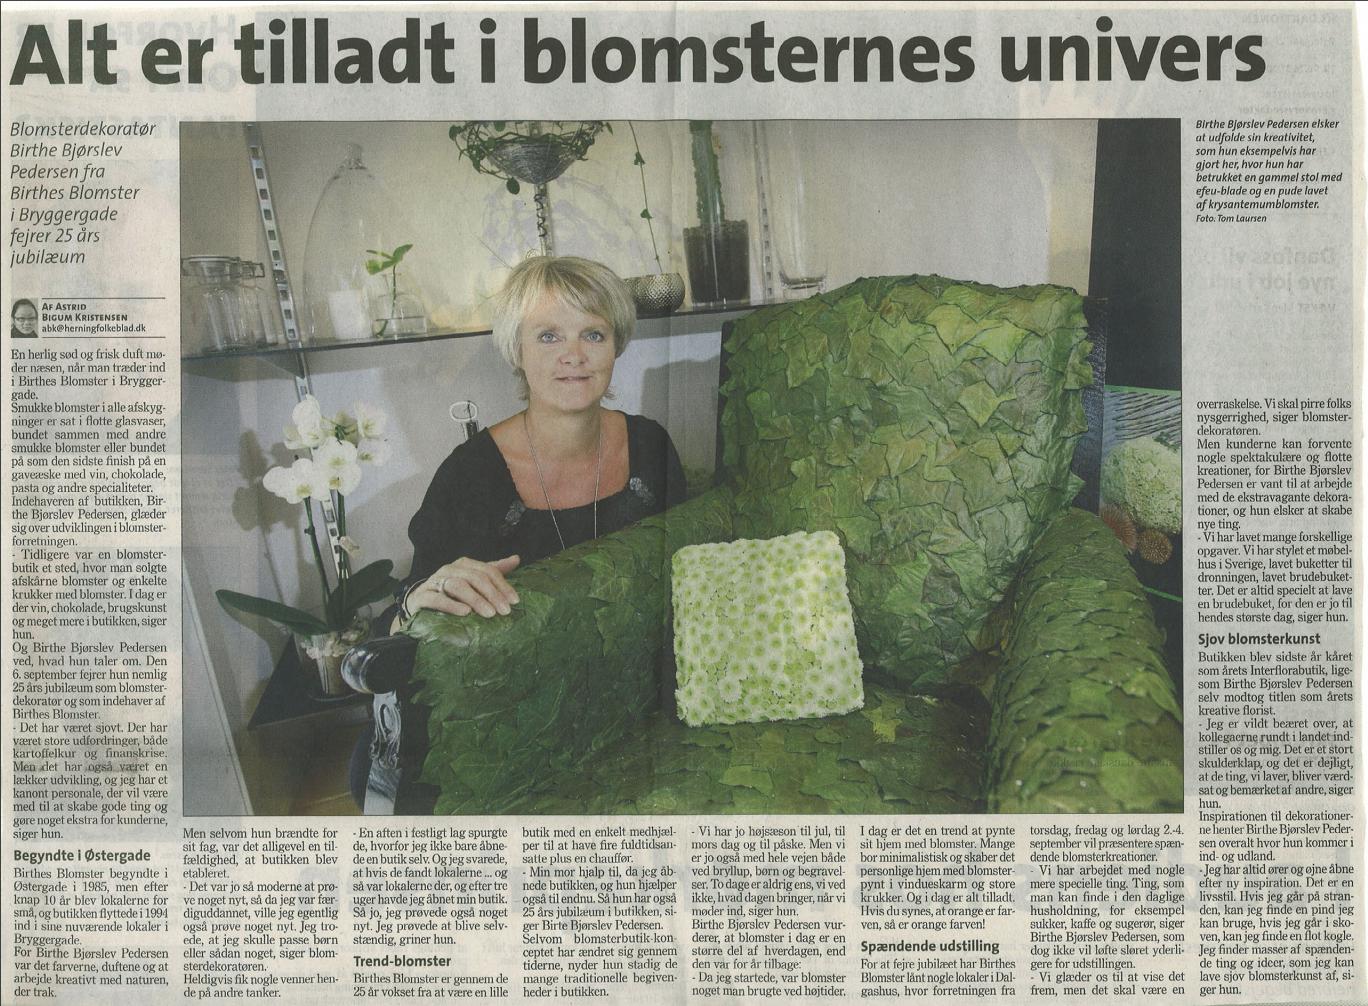 25 års Jubilærum   Birthes Blomster